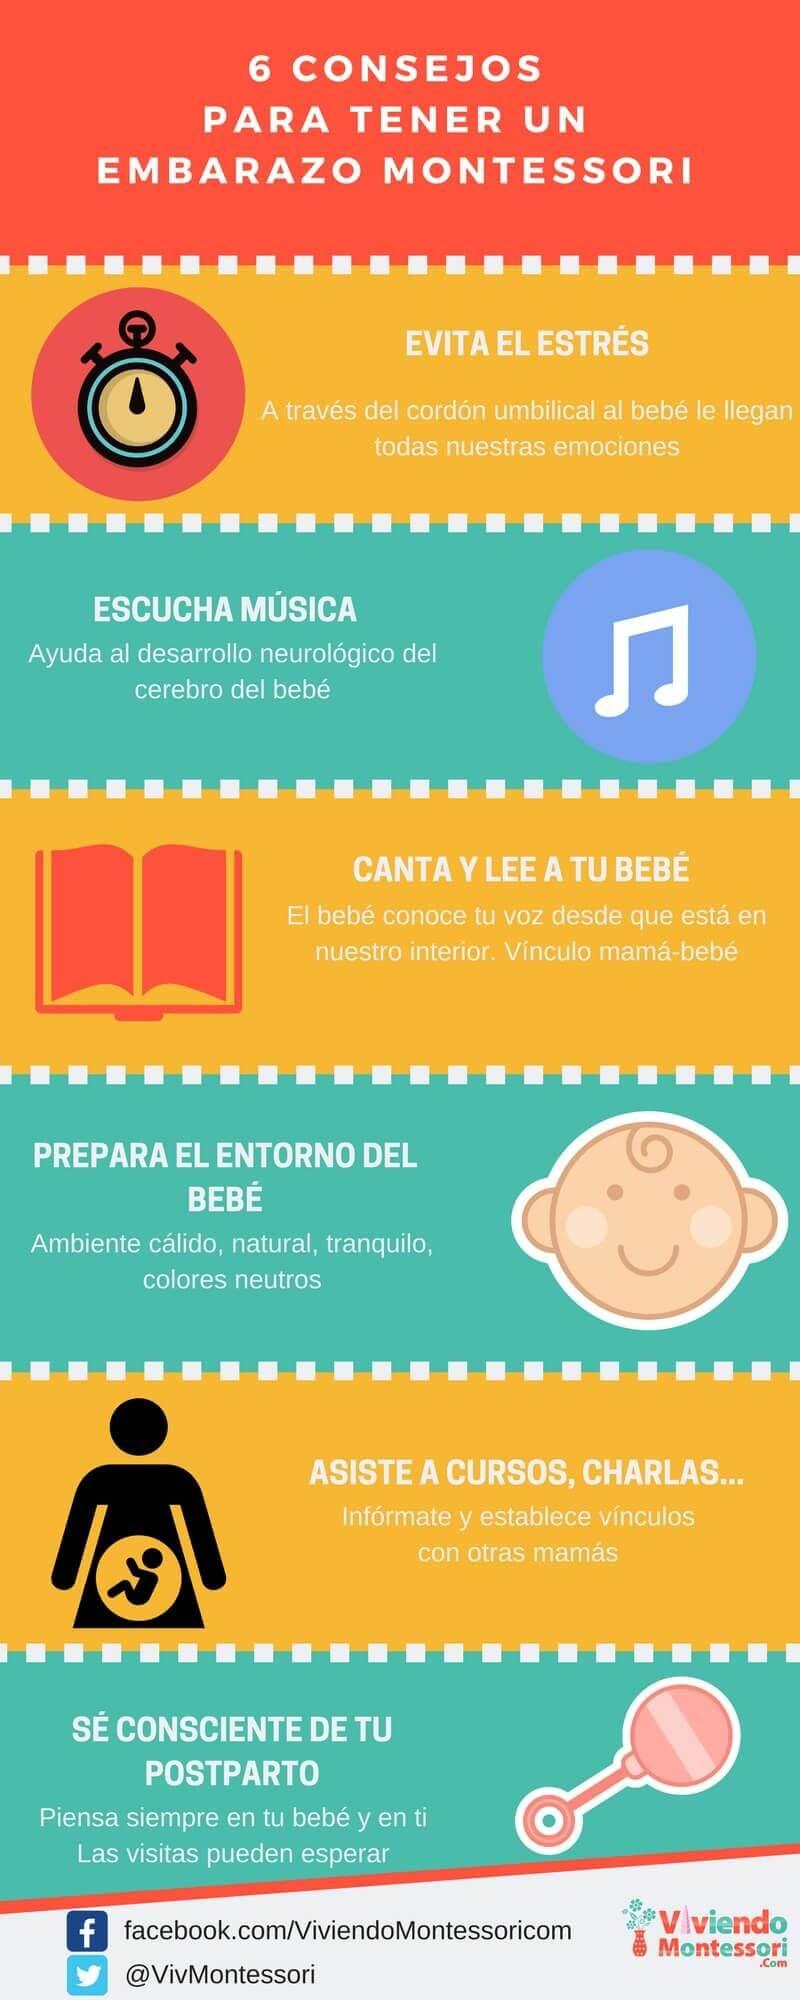 6 Consejos embarazo Montessori - INFOGRAFIA